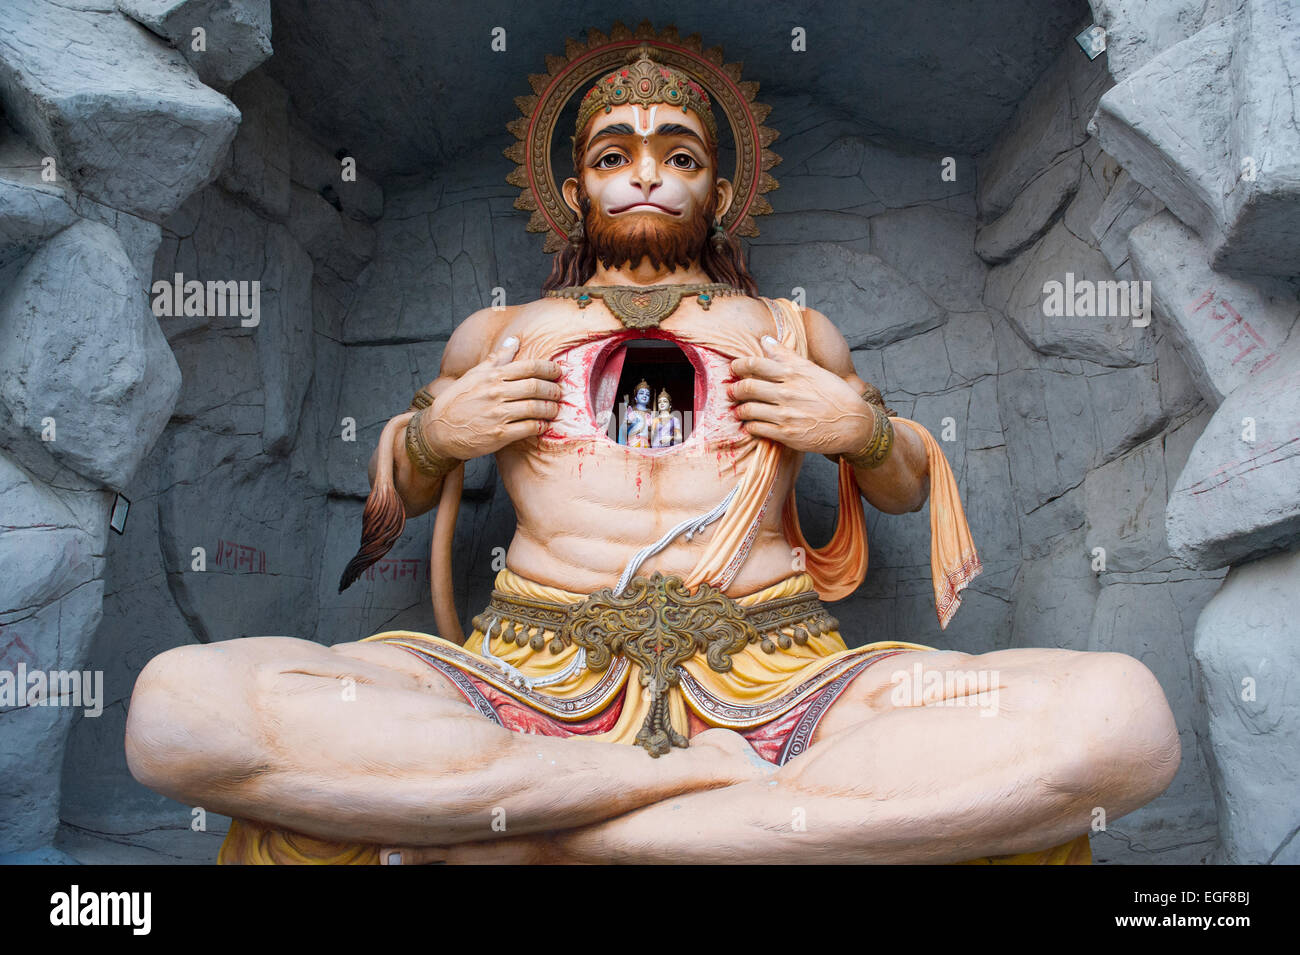 Hanuman statue at Parmarth Niketan Temple, Swarg Ashram on the banks of the Ganges (Ganga) in Rishikesh, Uttarakhand, - Stock Image